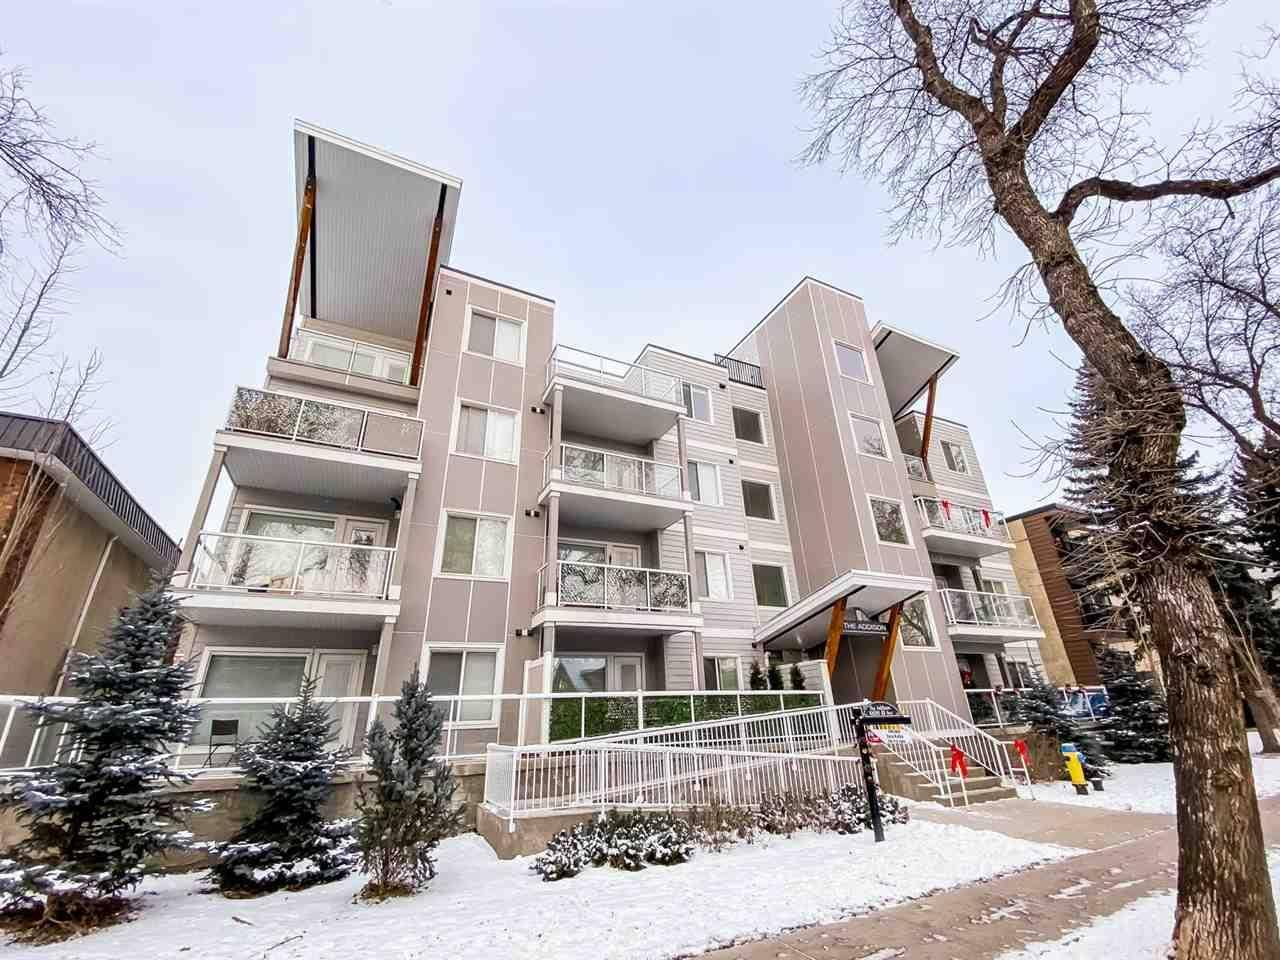 403 - 10030 83 Avenue Nw, Edmonton | Image 1